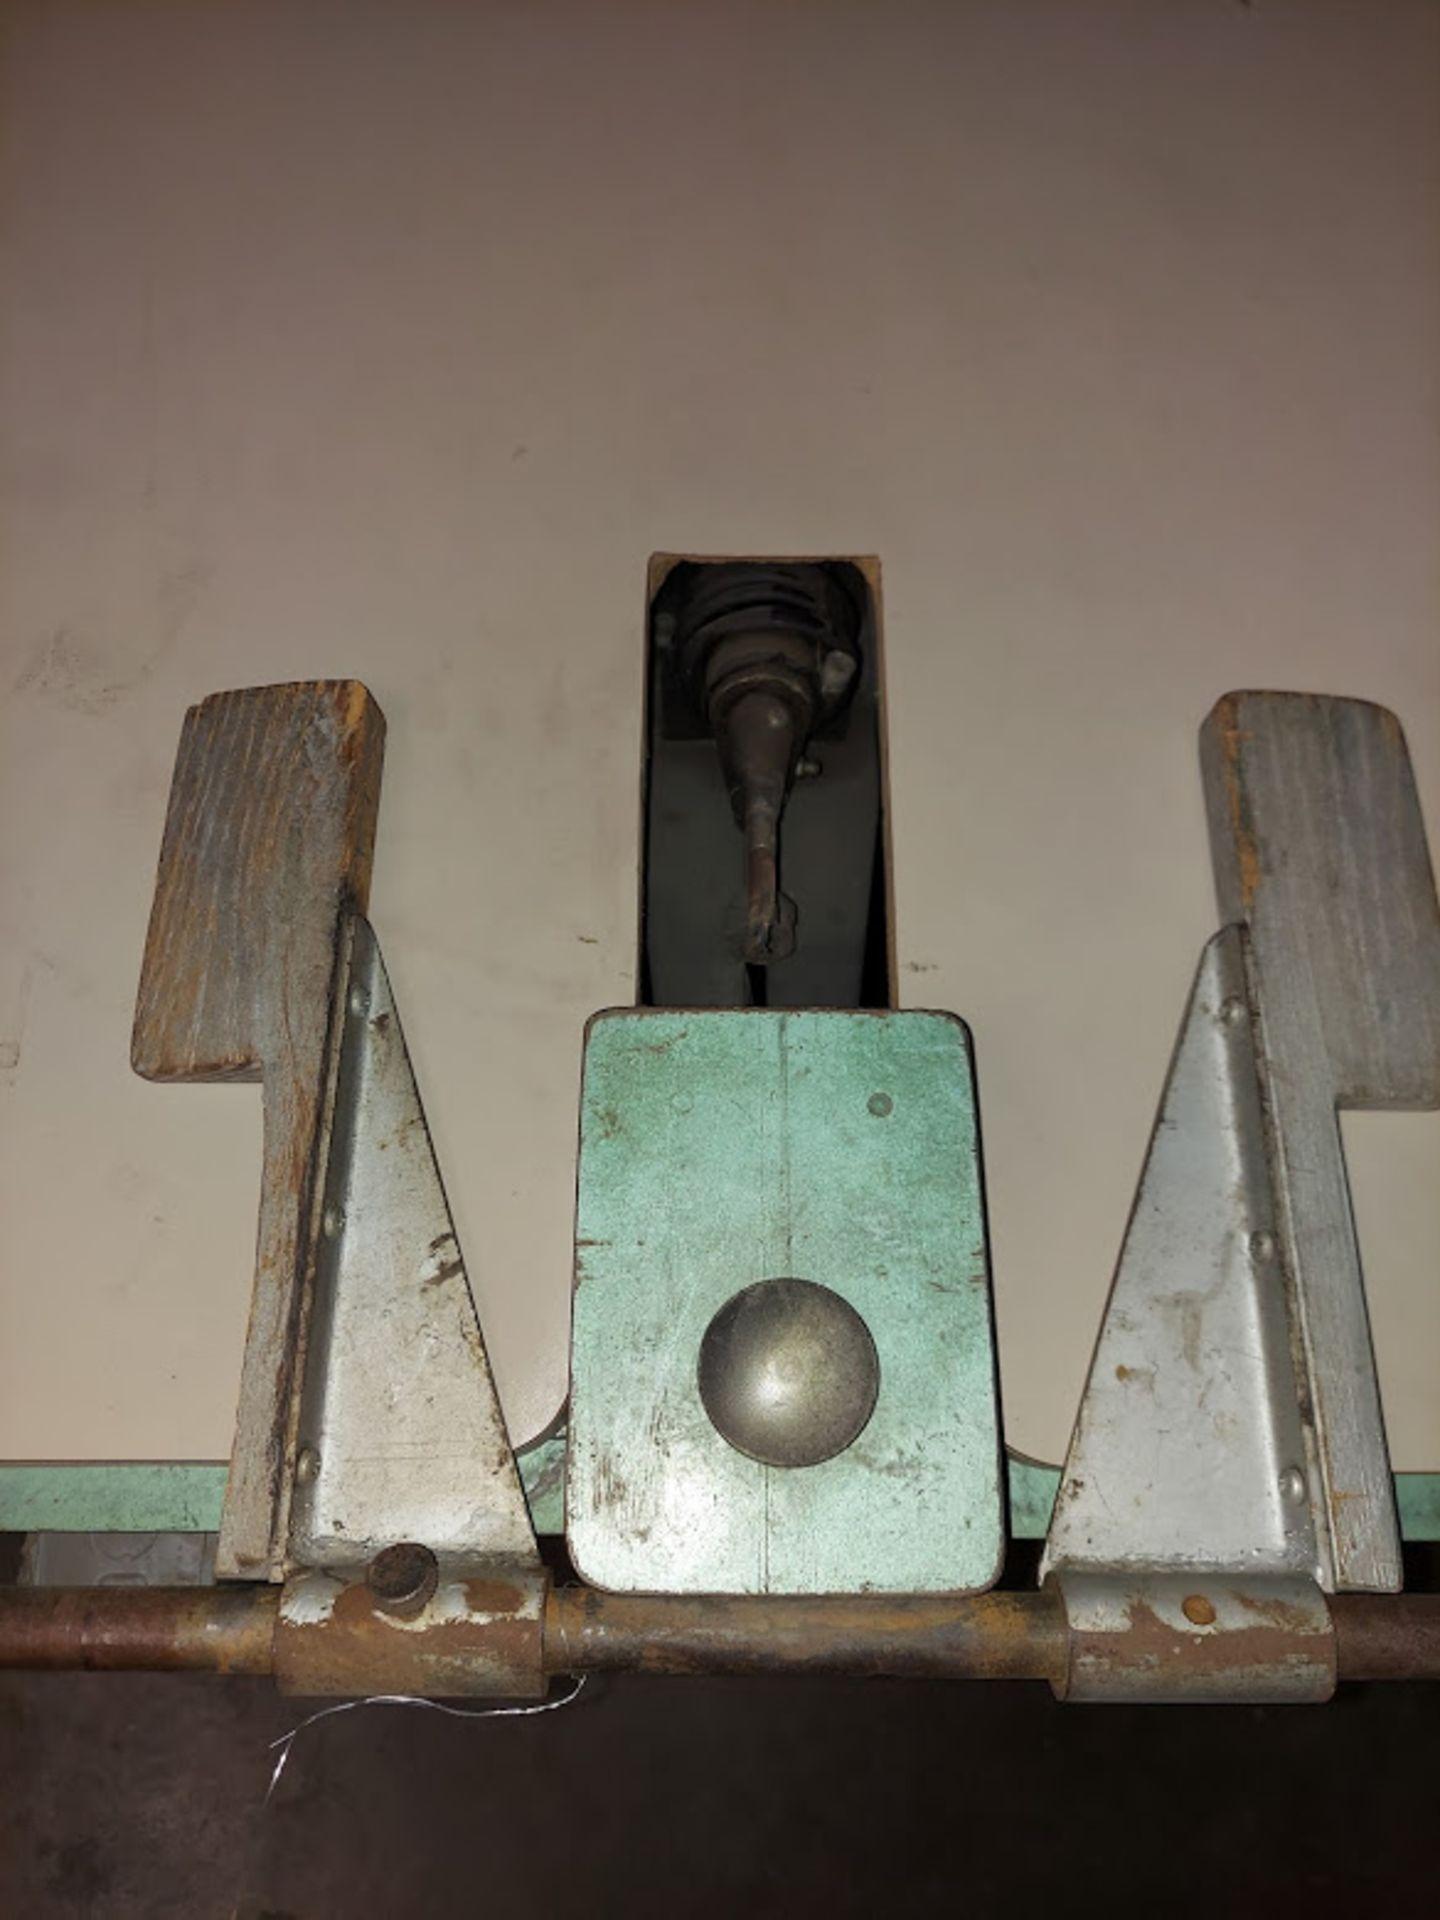 Evans & Royal Pocket Boring Machine, Model # 600, Dayton 115 Volts 1 Phase Motor - Image 2 of 4